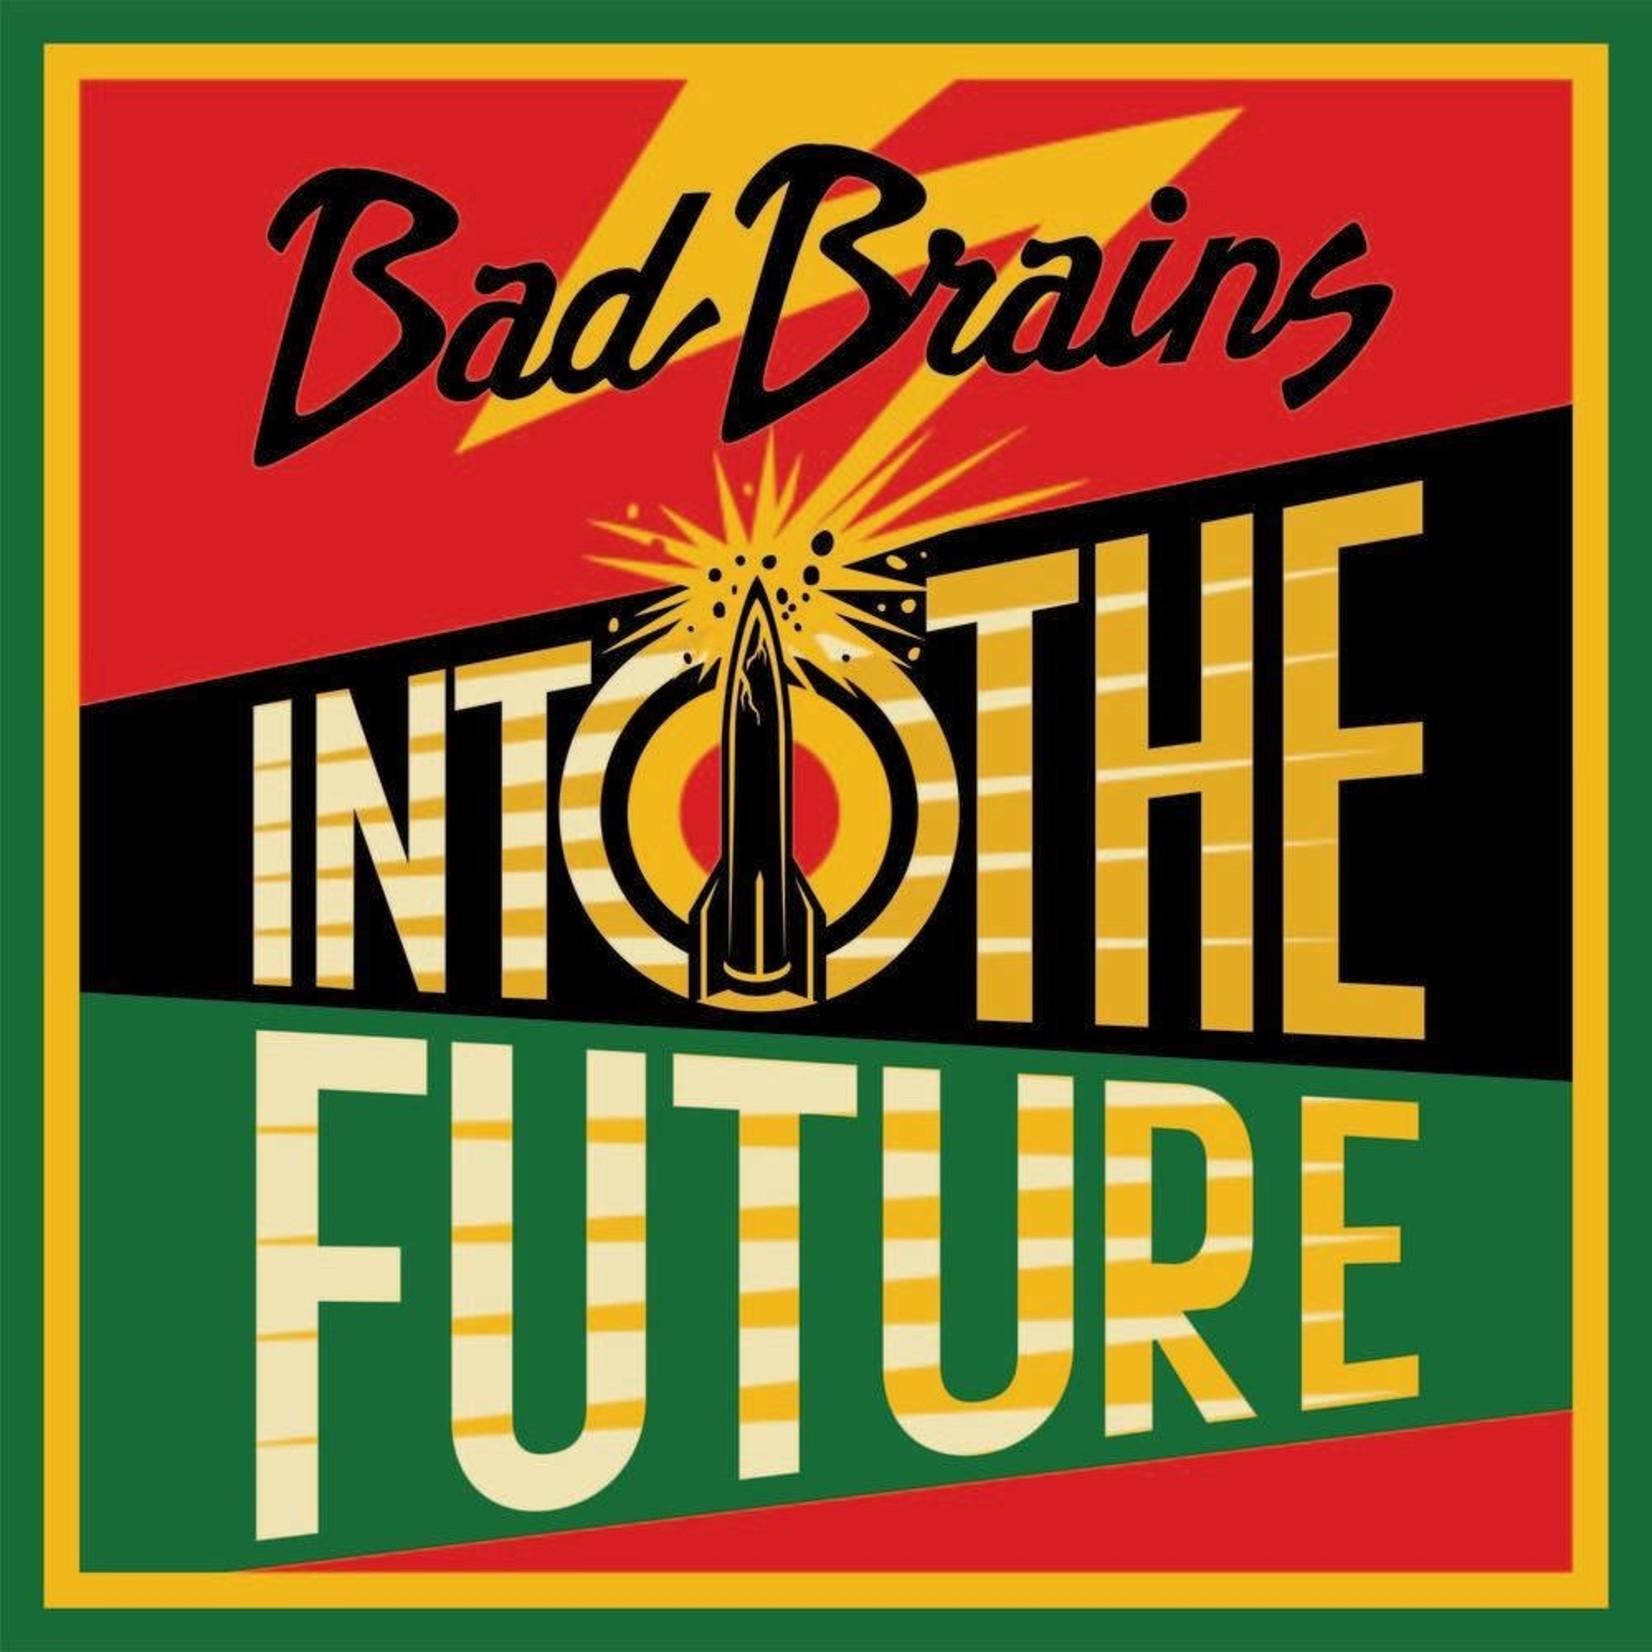 [New] Bad Brains: Into The Future (Shepard Fairey alternate cover)